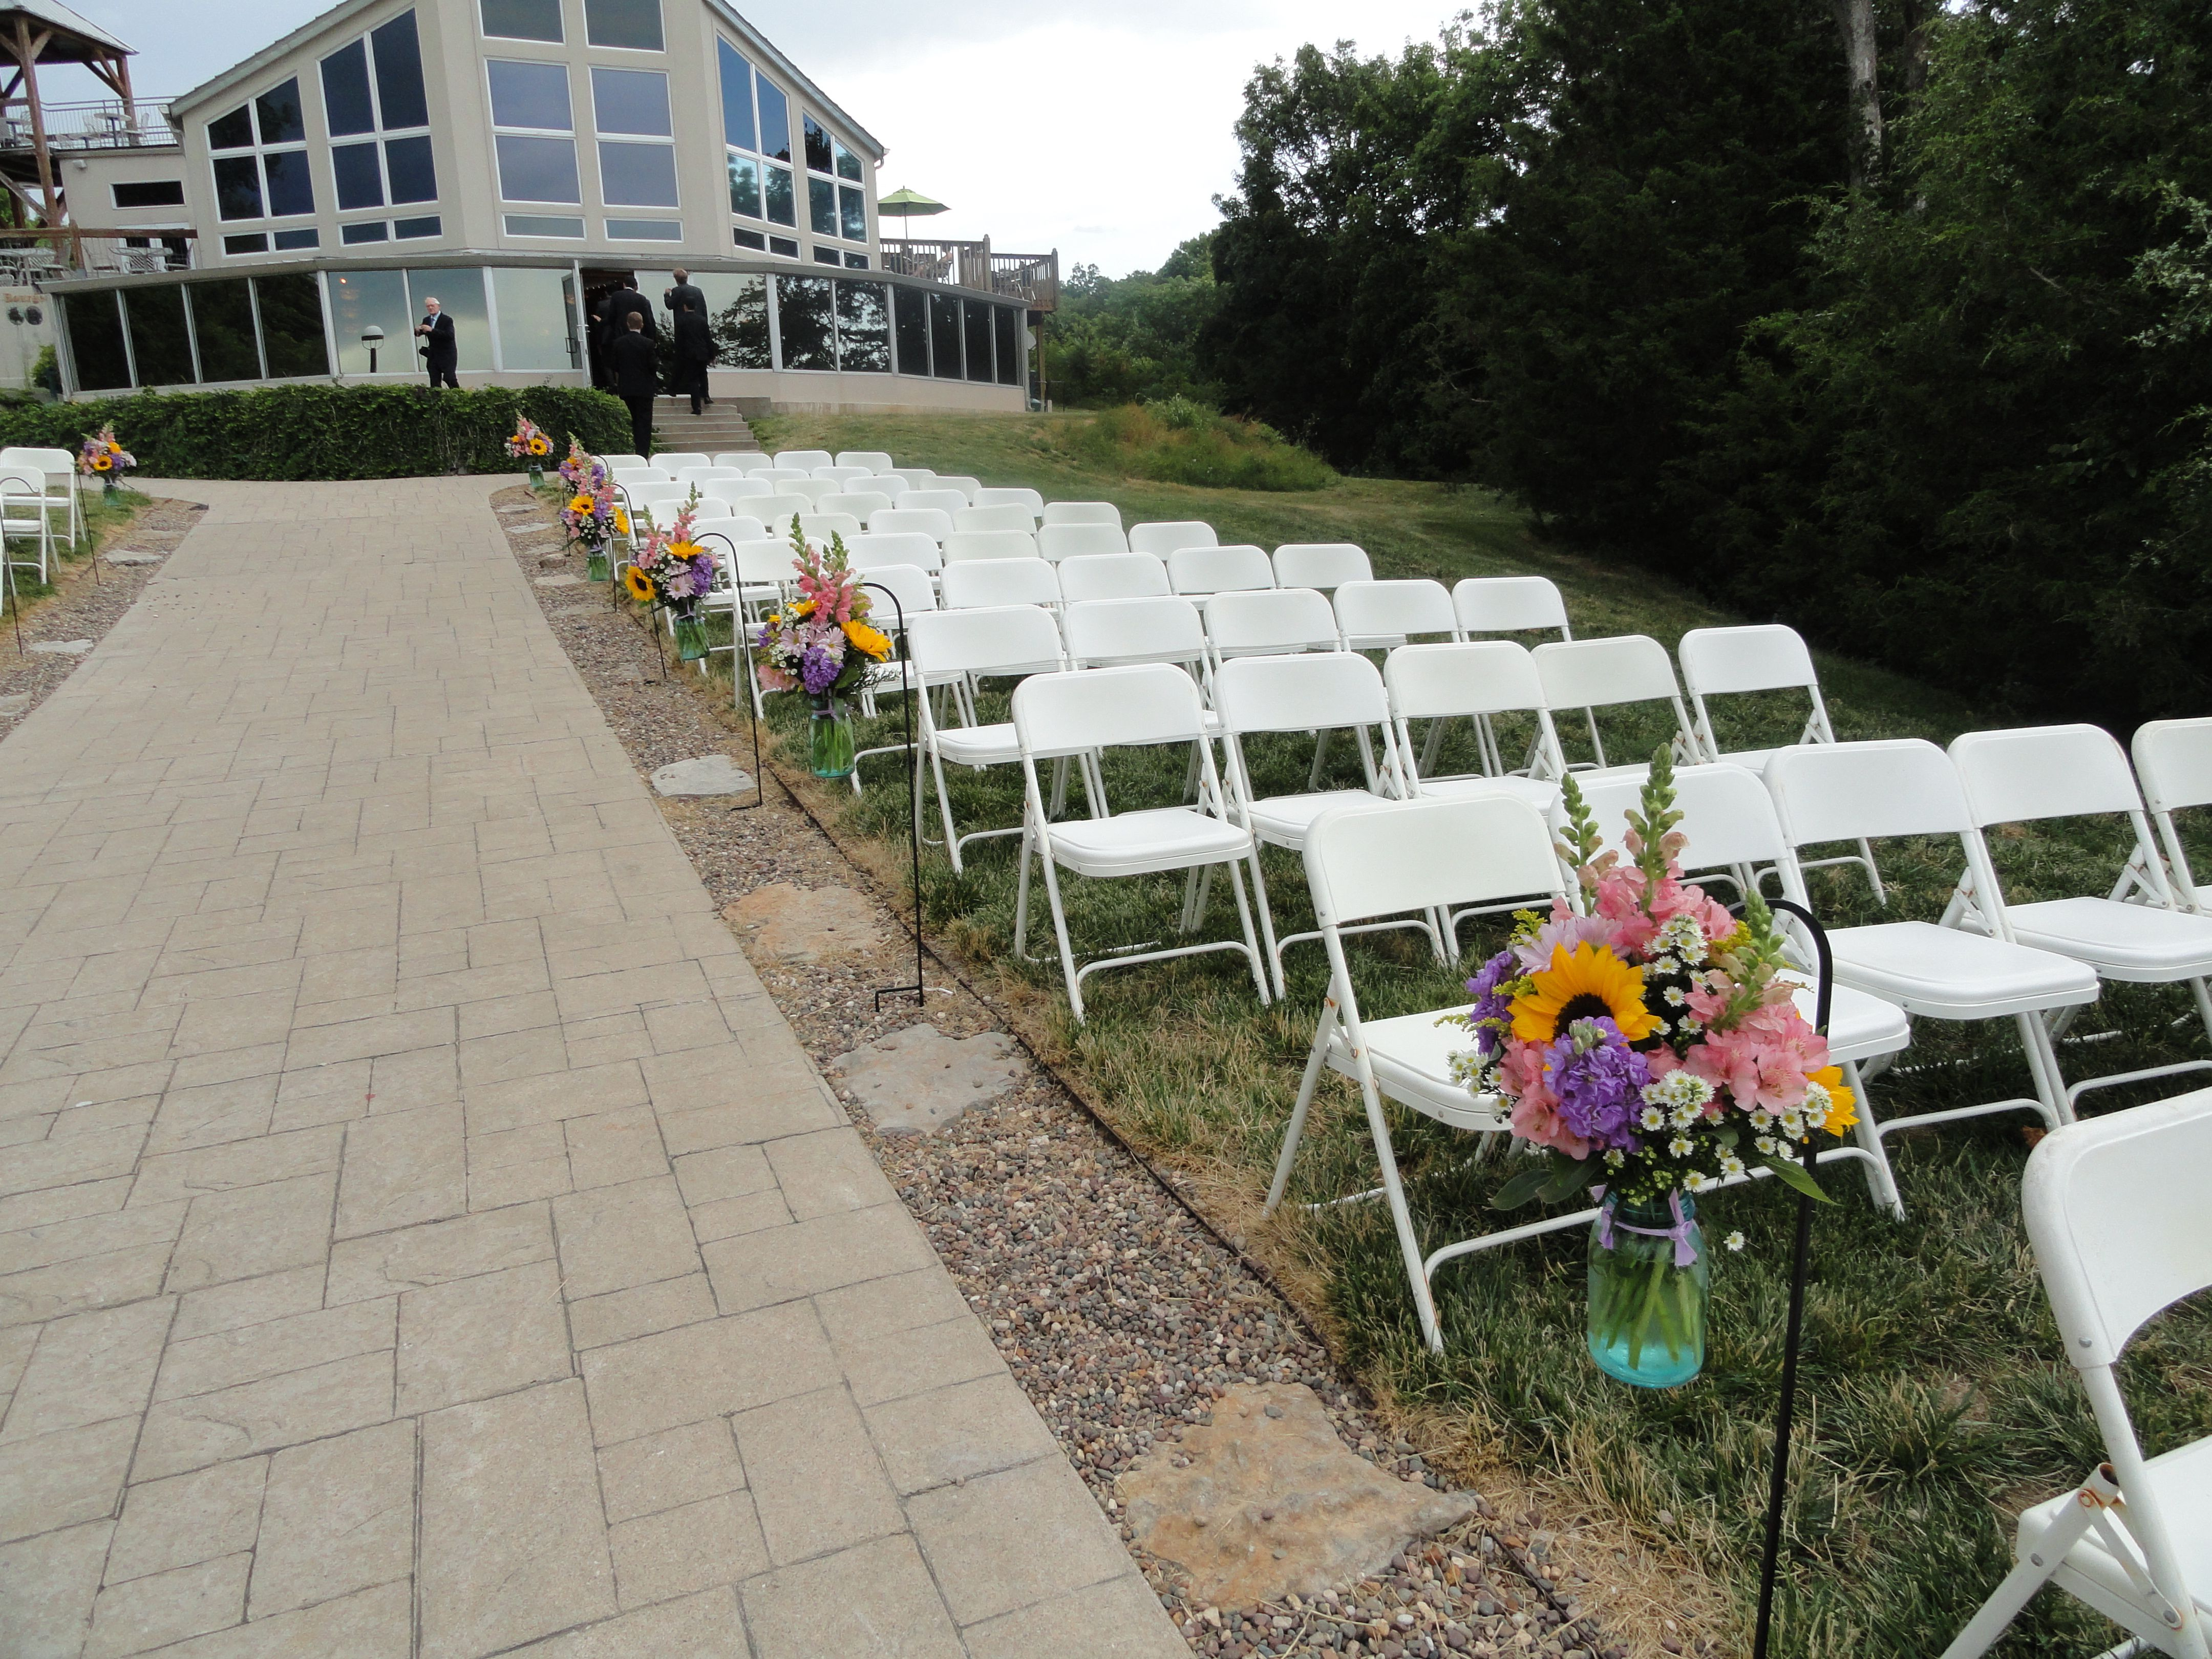 16++ Outdoor wedding venues near columbia mo information